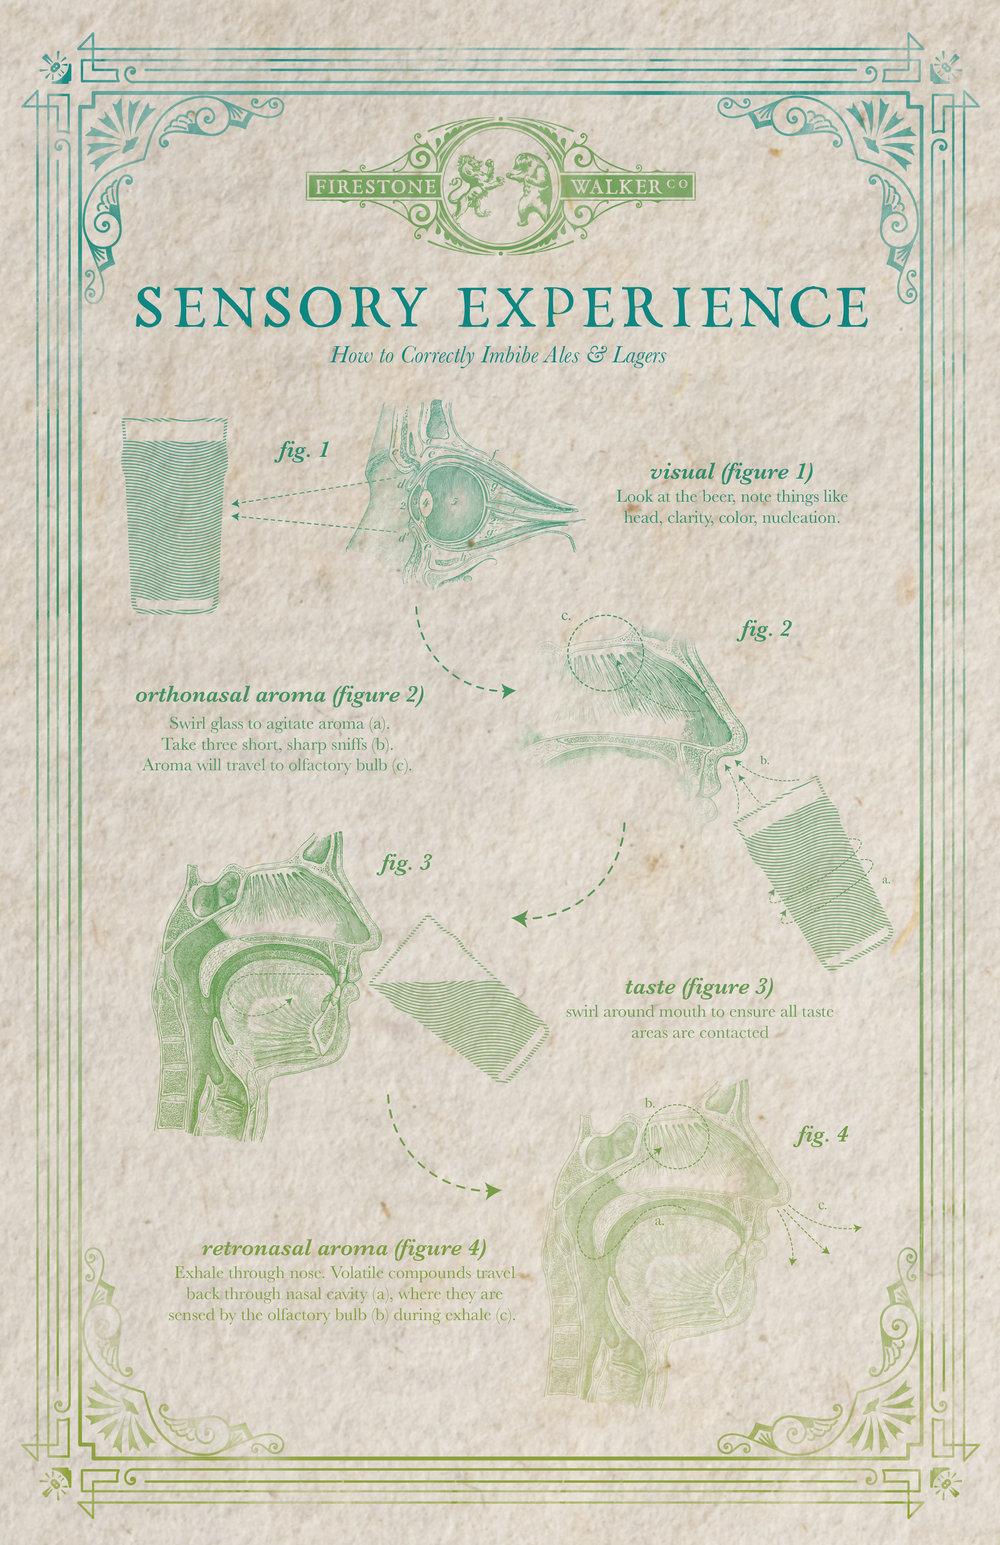 sensoryexperience_poster.jpg